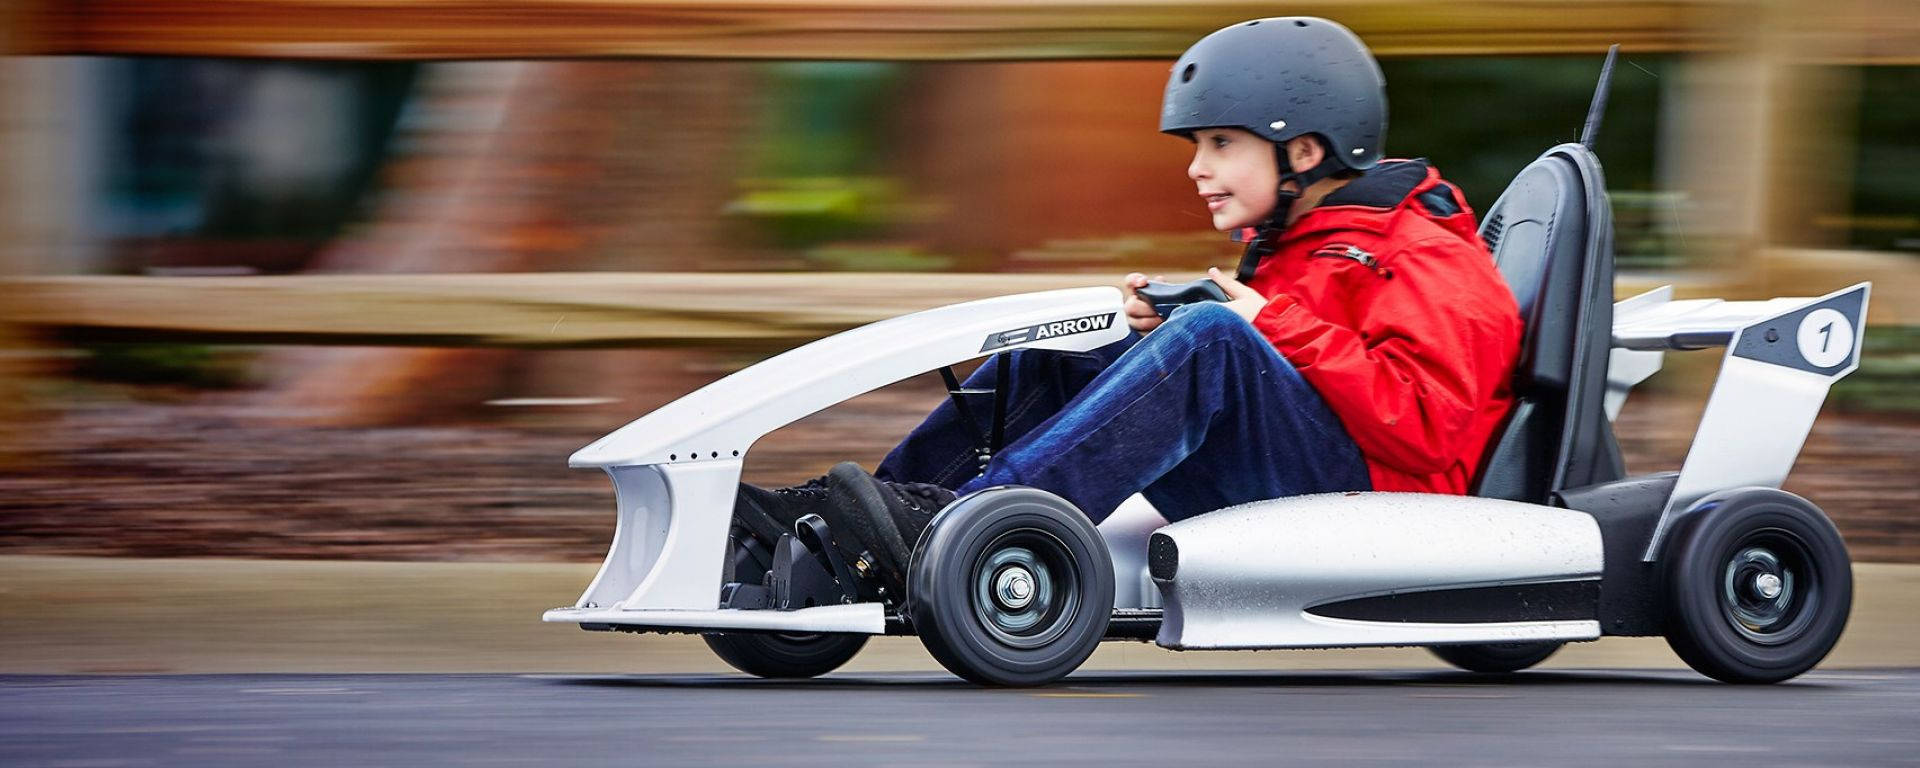 Actev Arrow Smart-Kart: il kart elettrico intelligente per bambini (foto Actev Motors)